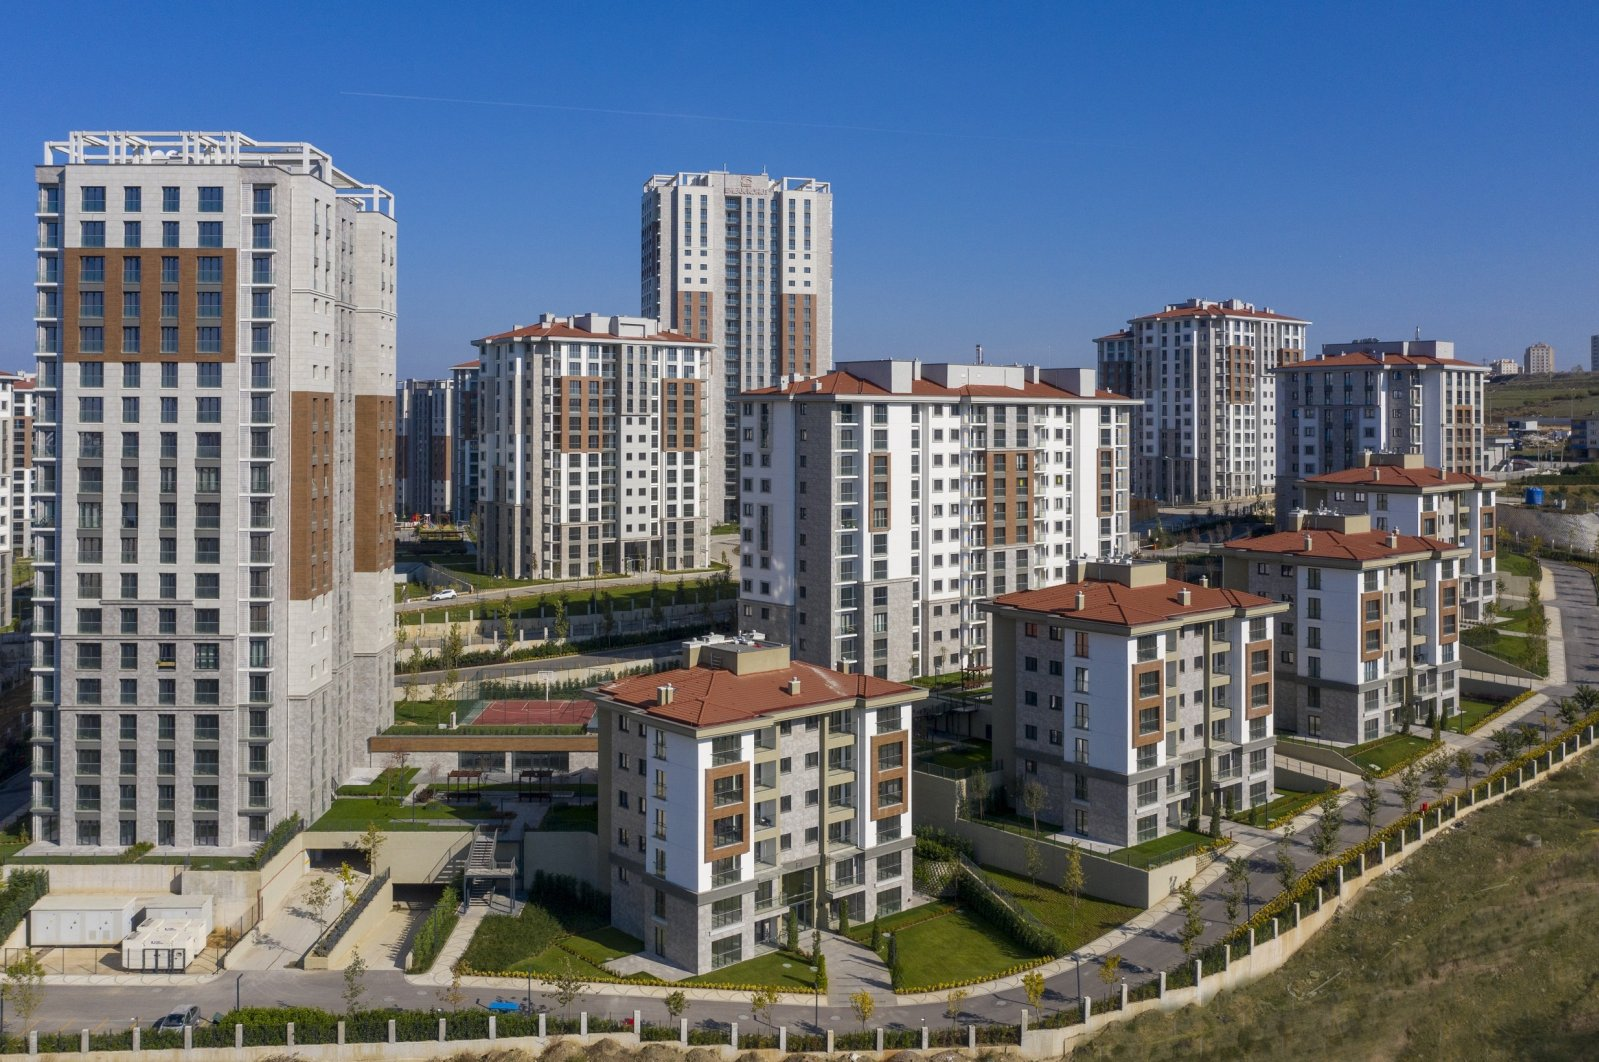 A housing project in Gebze district of northwestern Kocaeli province, Turkey, June 5, 2020. (Sabah File Photo)